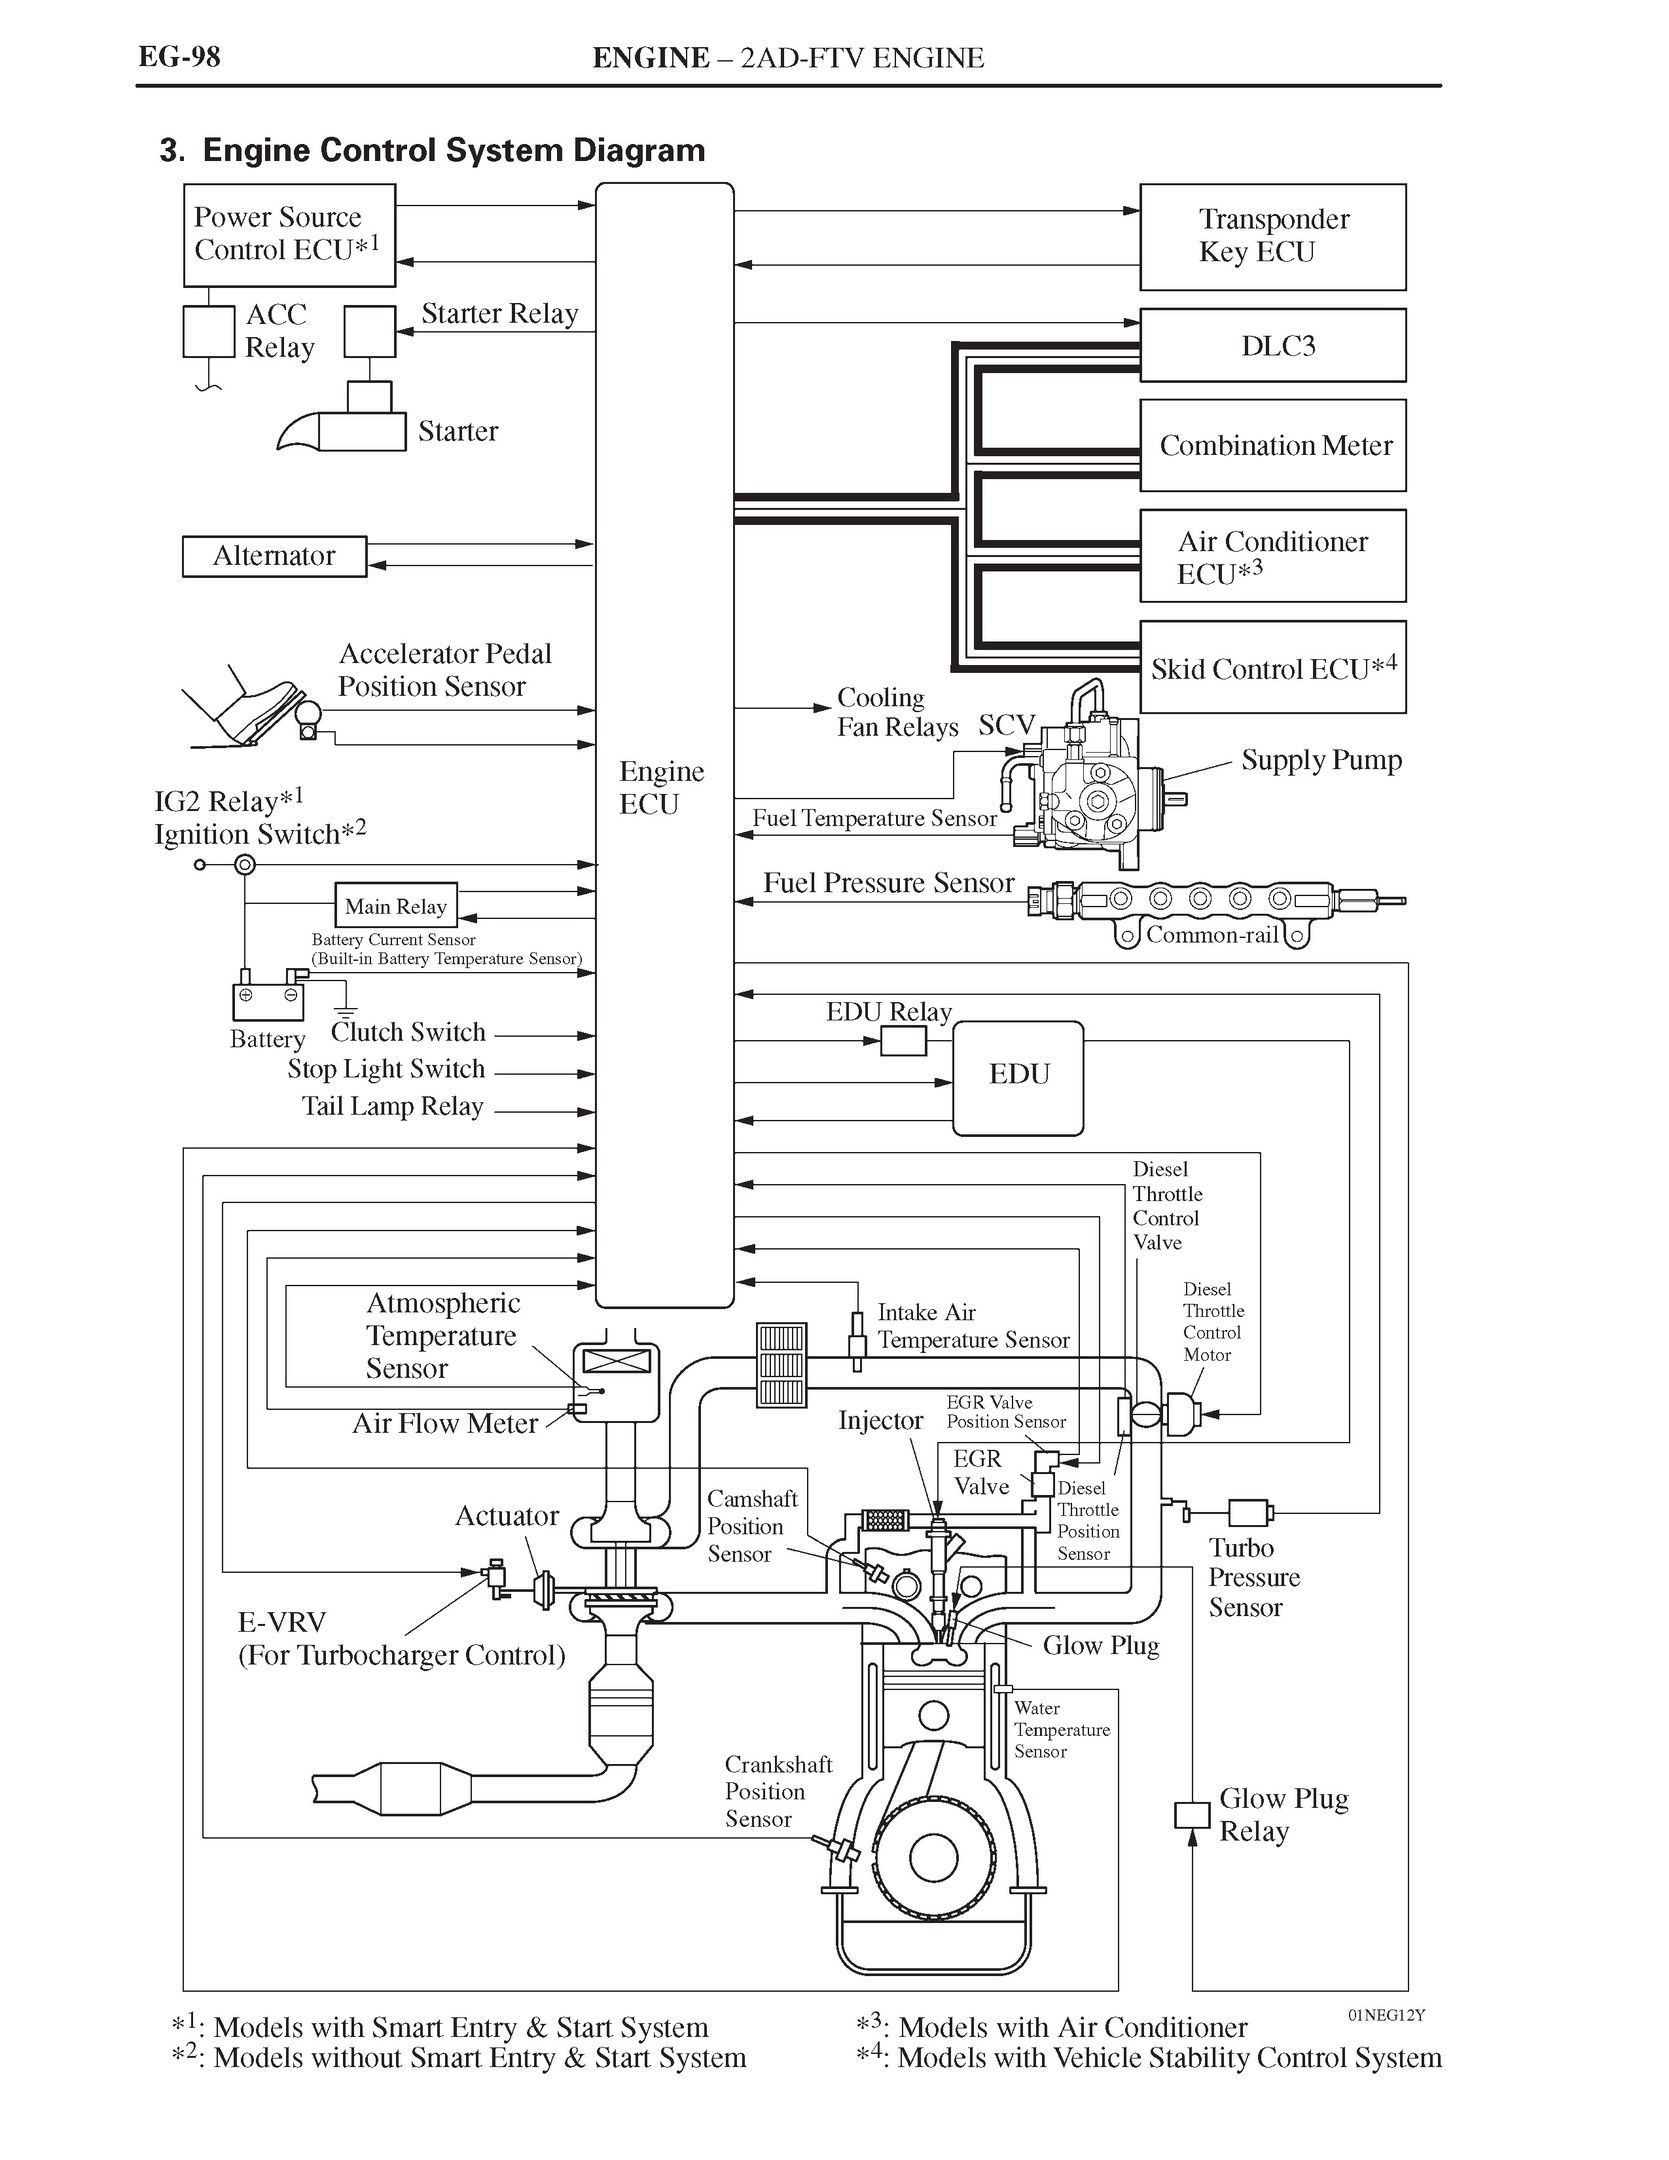 UK, Europe, North America, Toyota RAV4, Electrical Wir - OEM Auto Repair  Manuals | Electrical wiring diagram, Rav4, Toyota rav4Pinterest